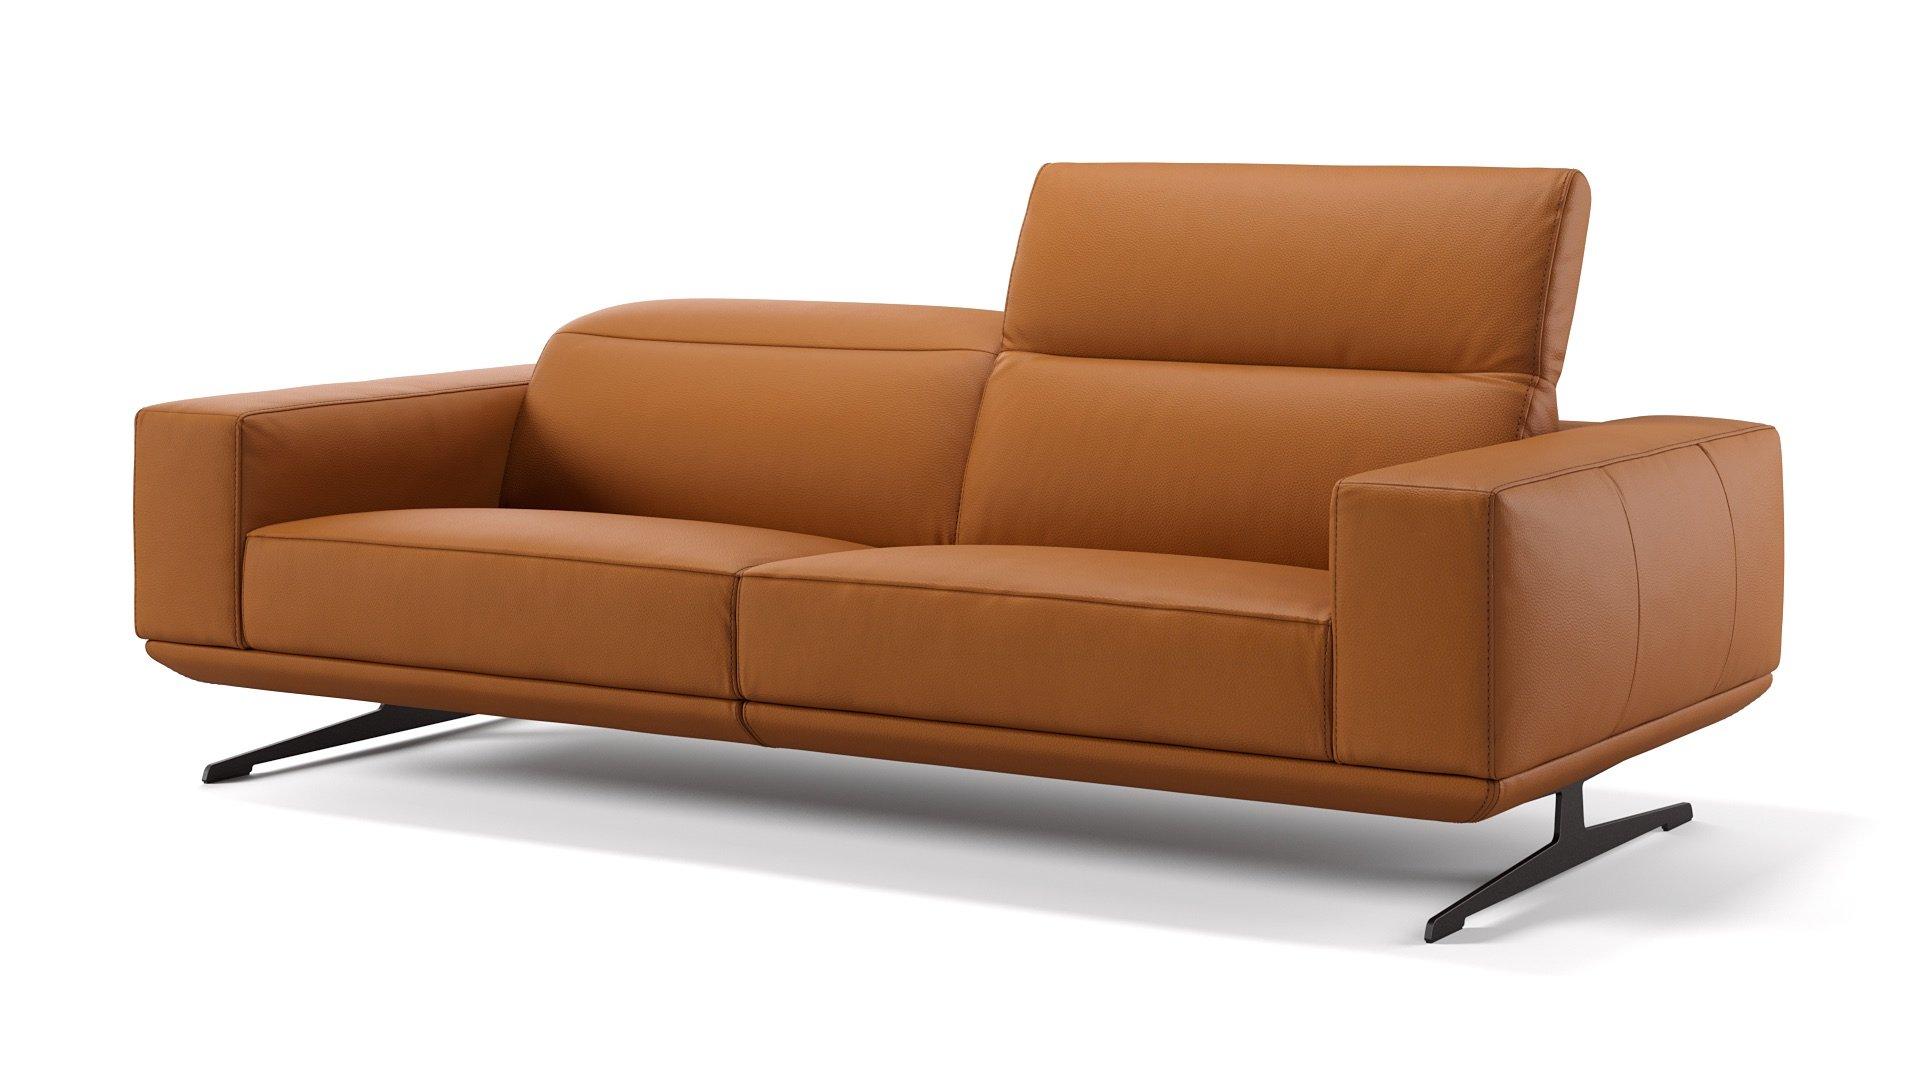 Leder 3-Sitzer Sofa MERANO